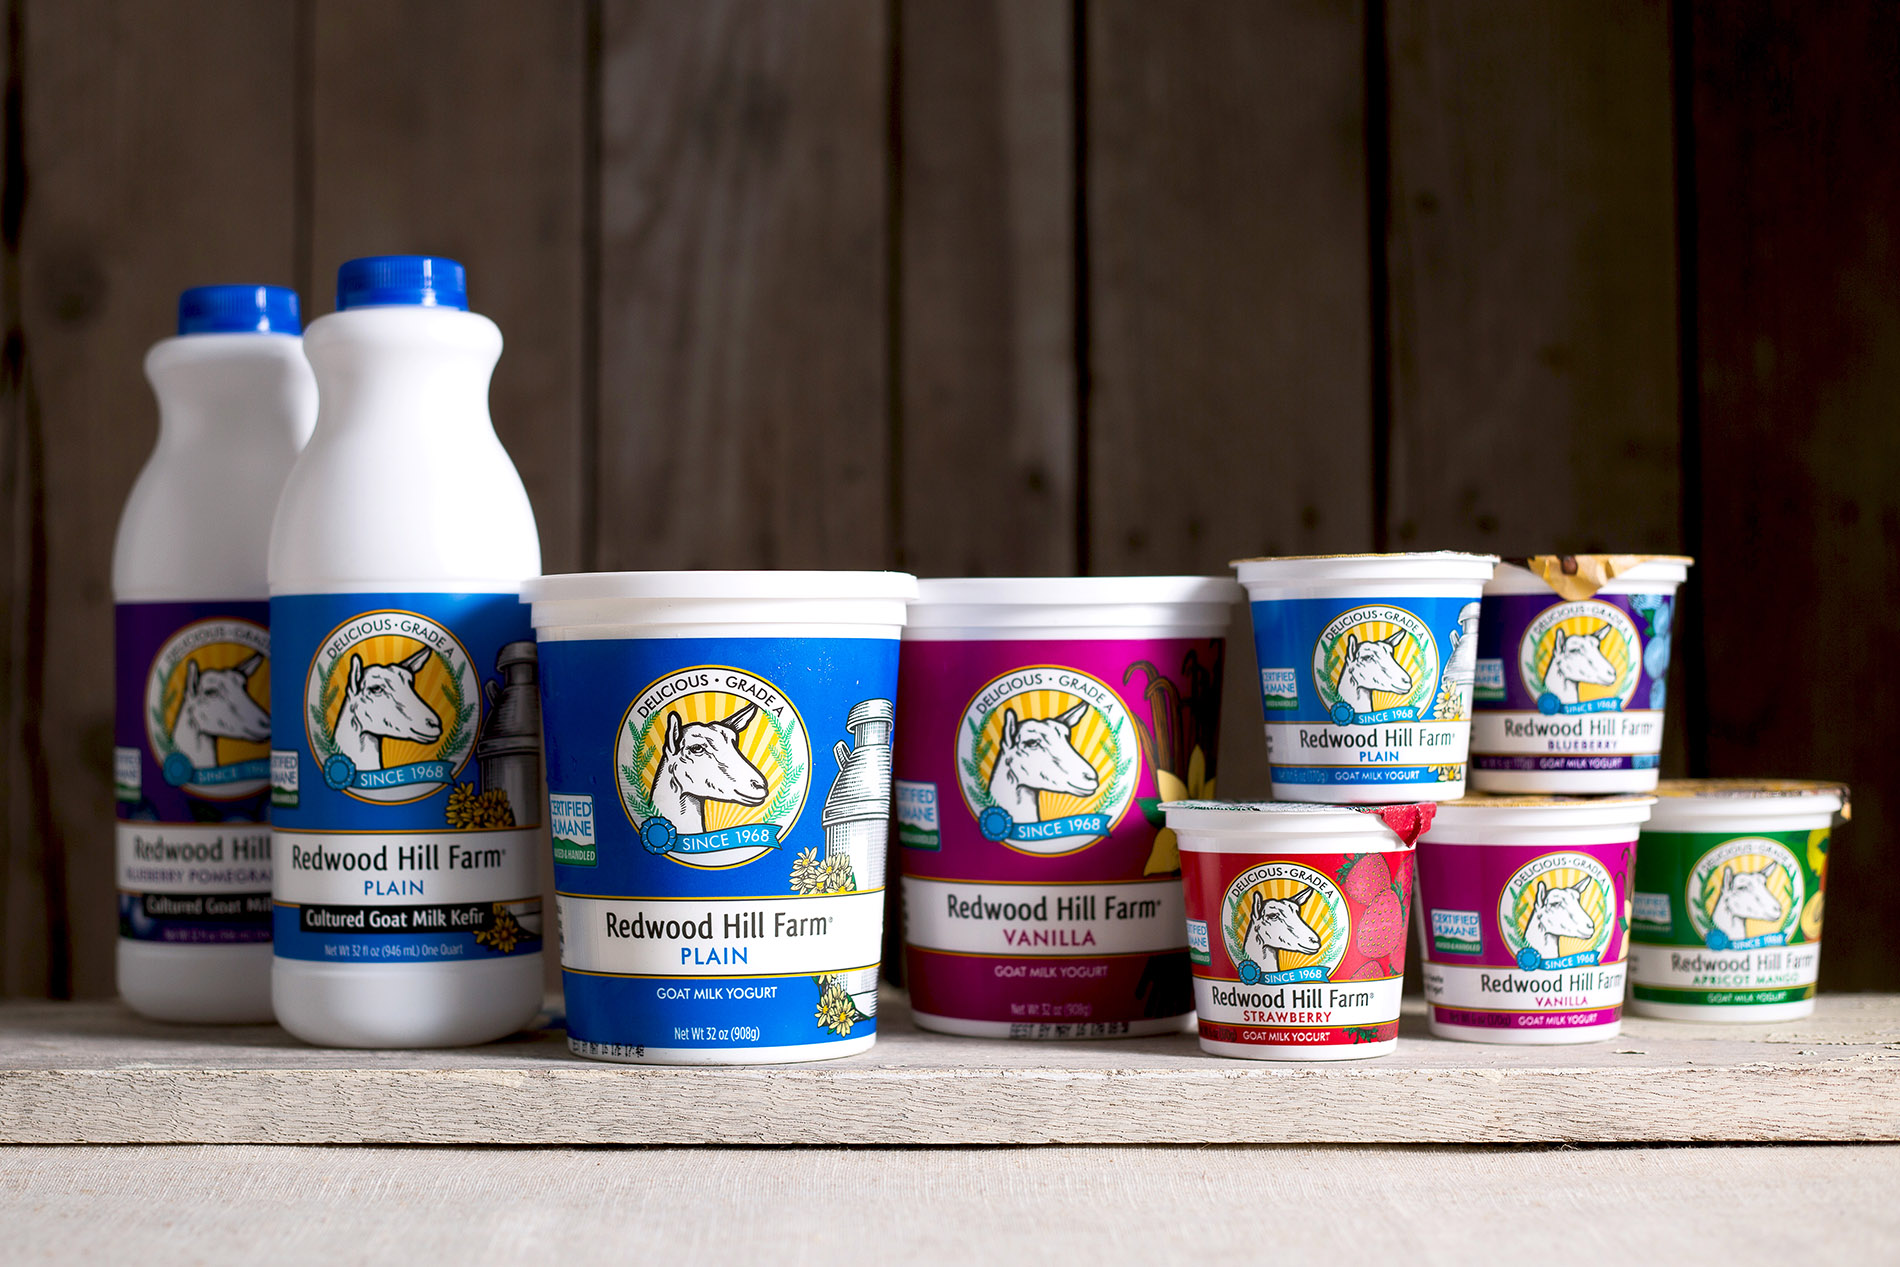 Where to Buy - Redwood Hill Farm Goat Yogurt and Kefir